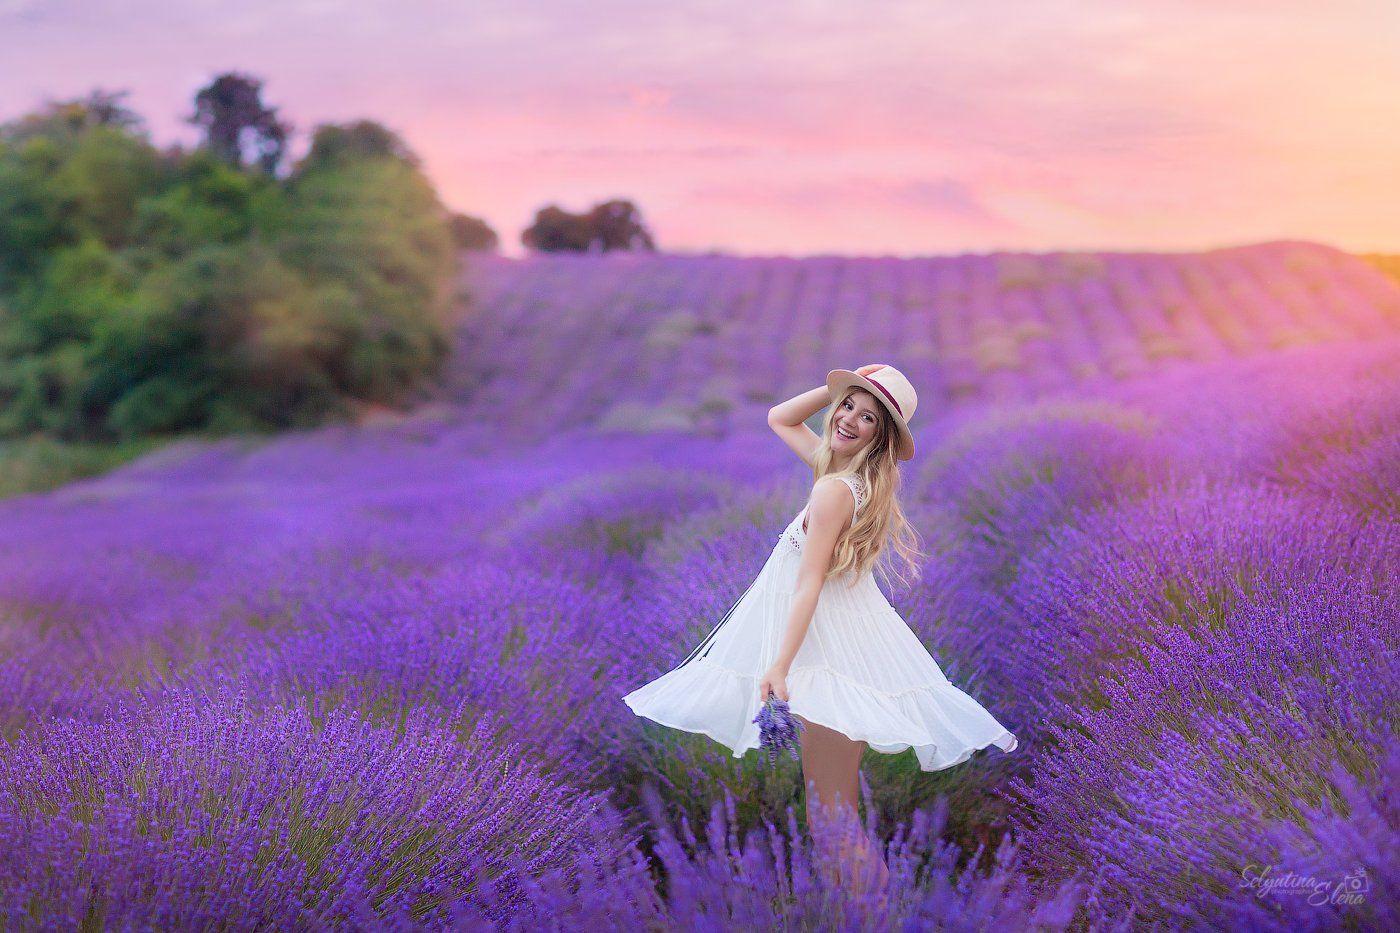 лаванда, lavender, поле лаванды, lavender field, семейный фотограф, детский фотограф, Elena Selyutina